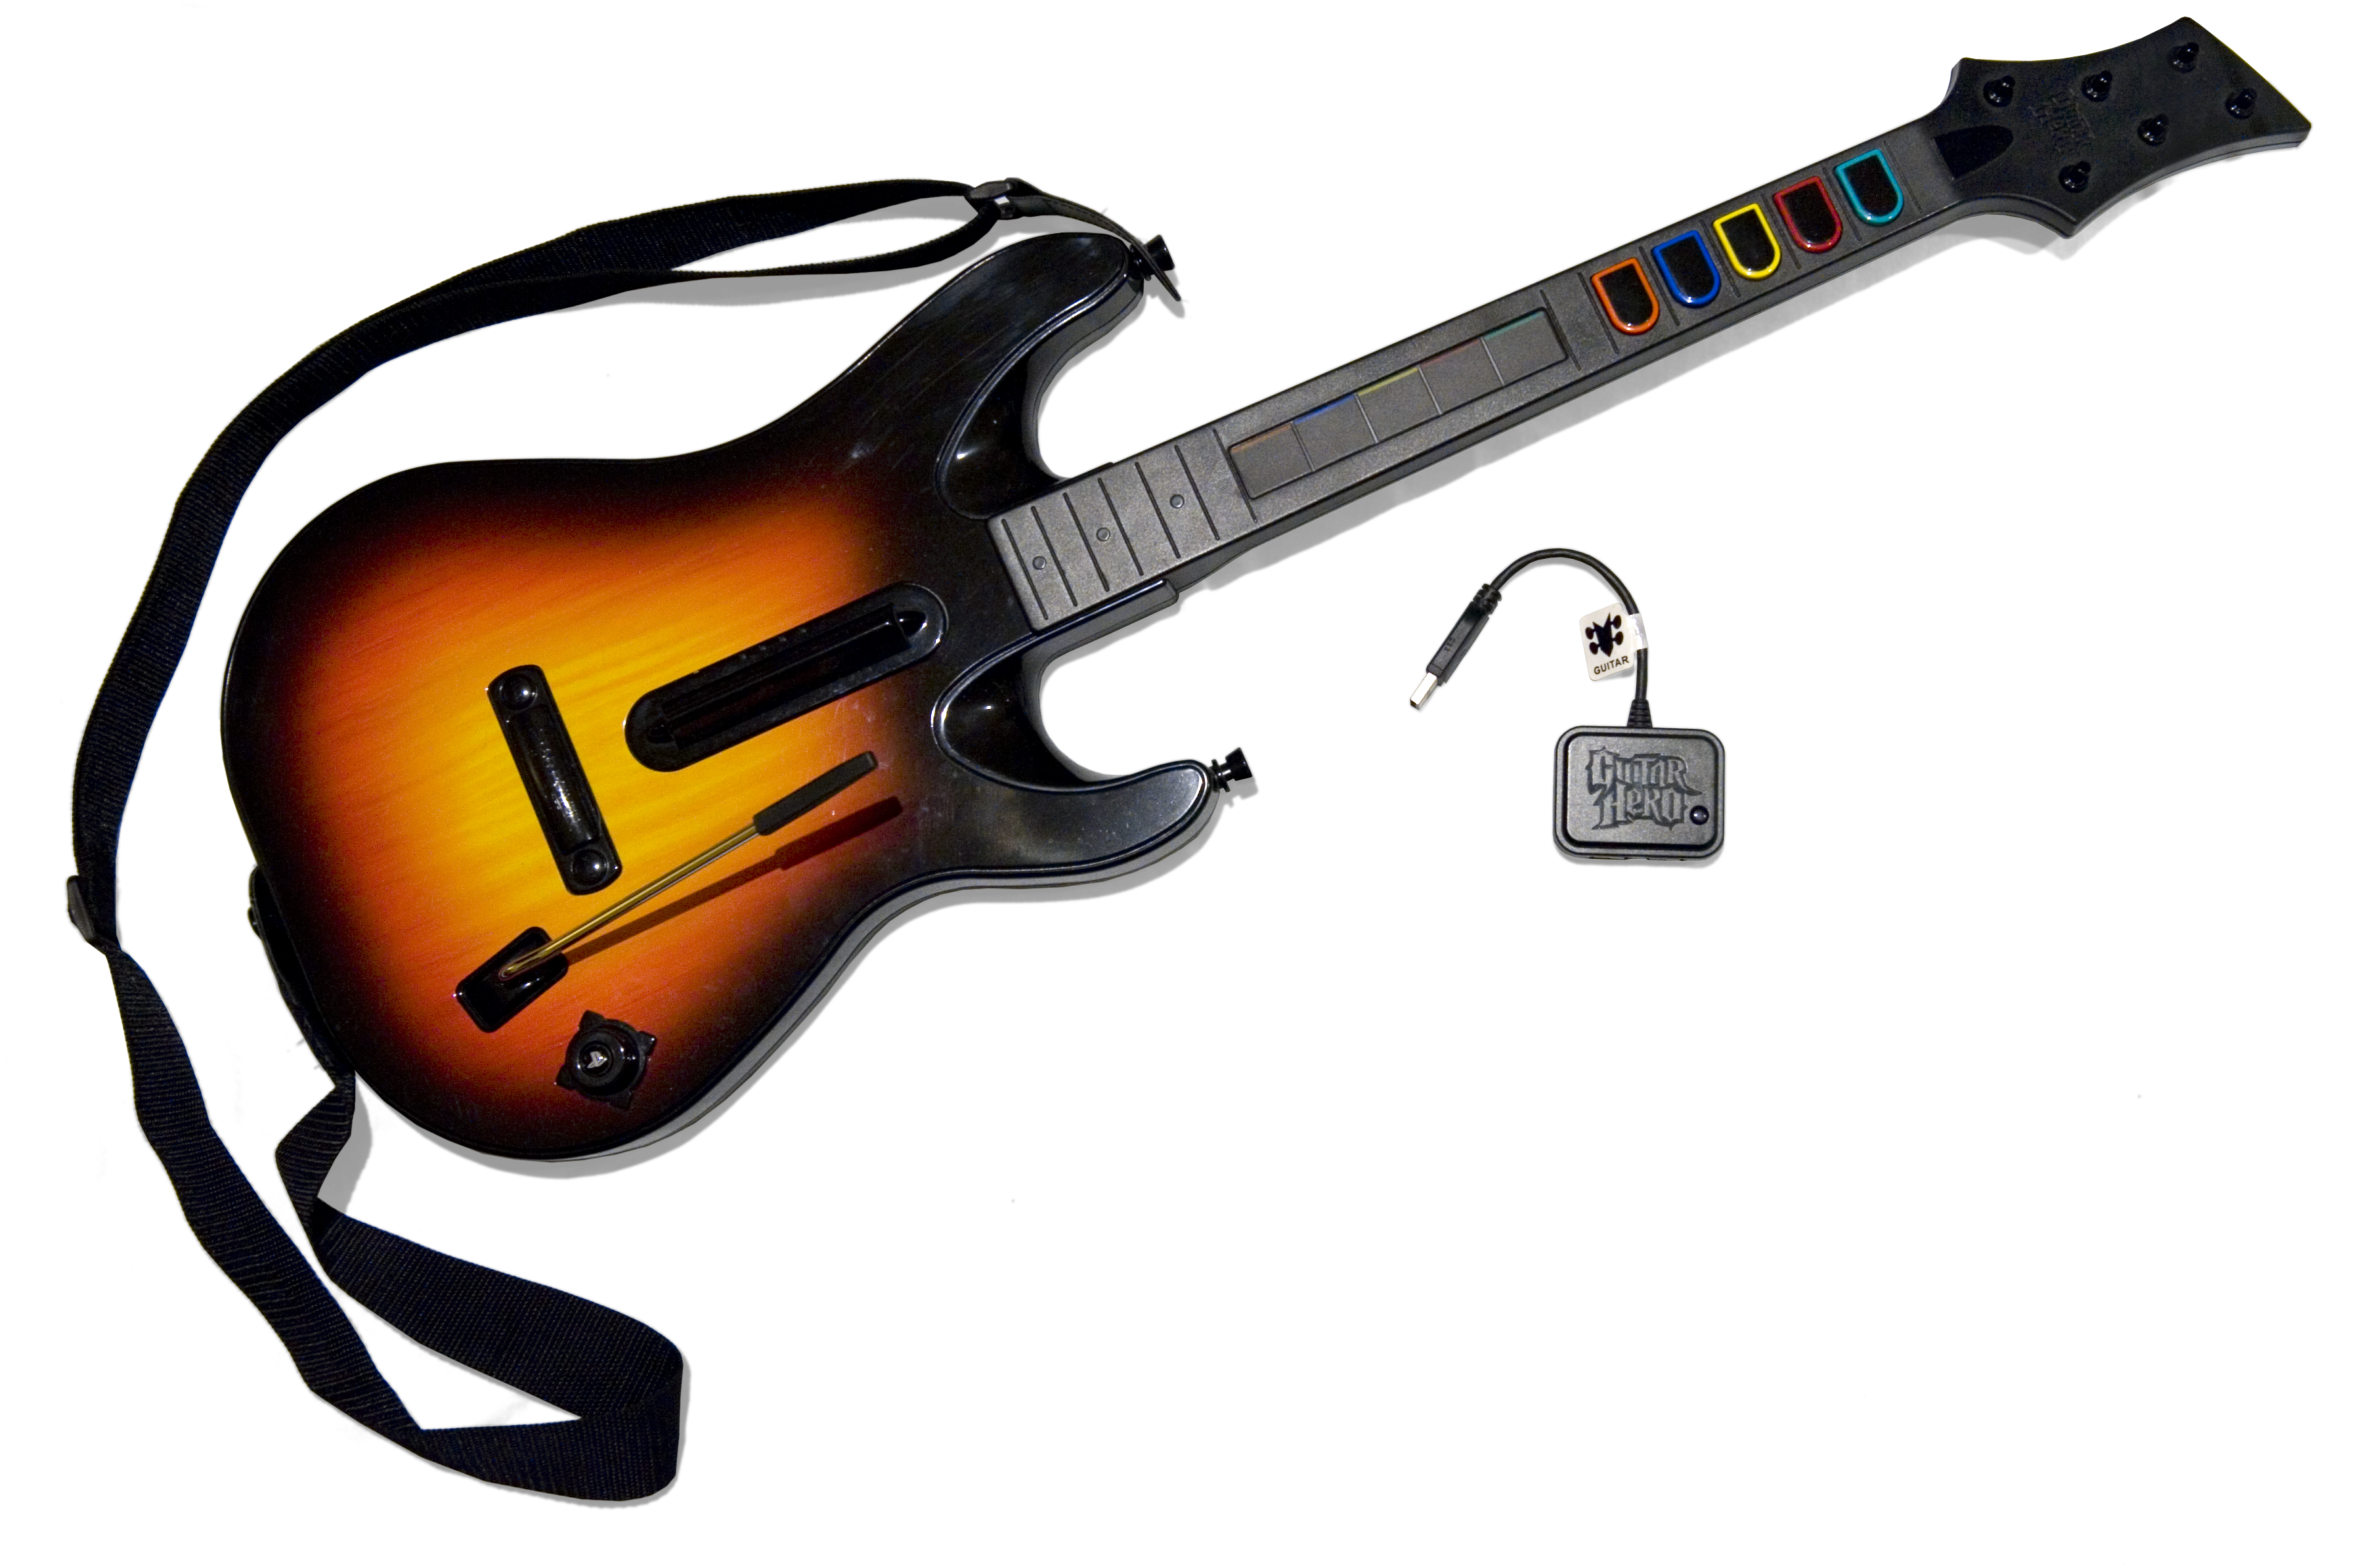 Musician clipart guitar hero. Ps controller transparent background